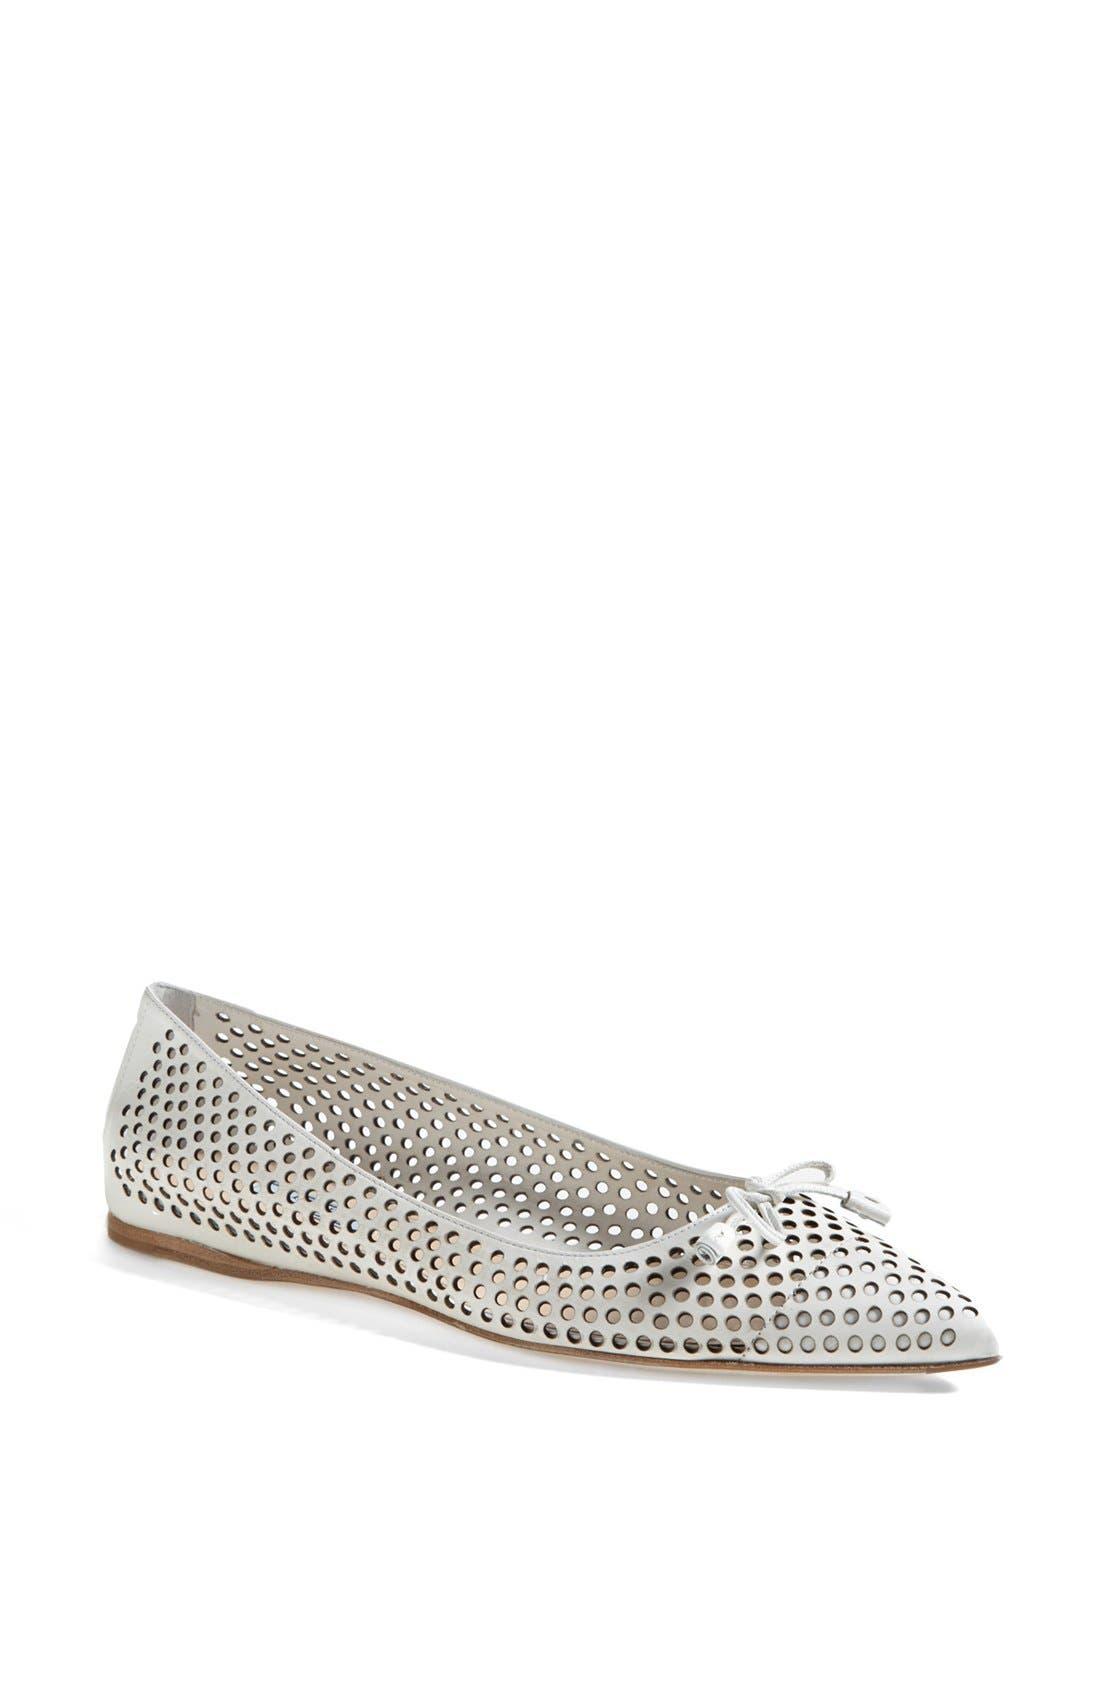 Main Image - Prada Pointed Toe Perforated Ballet Flat